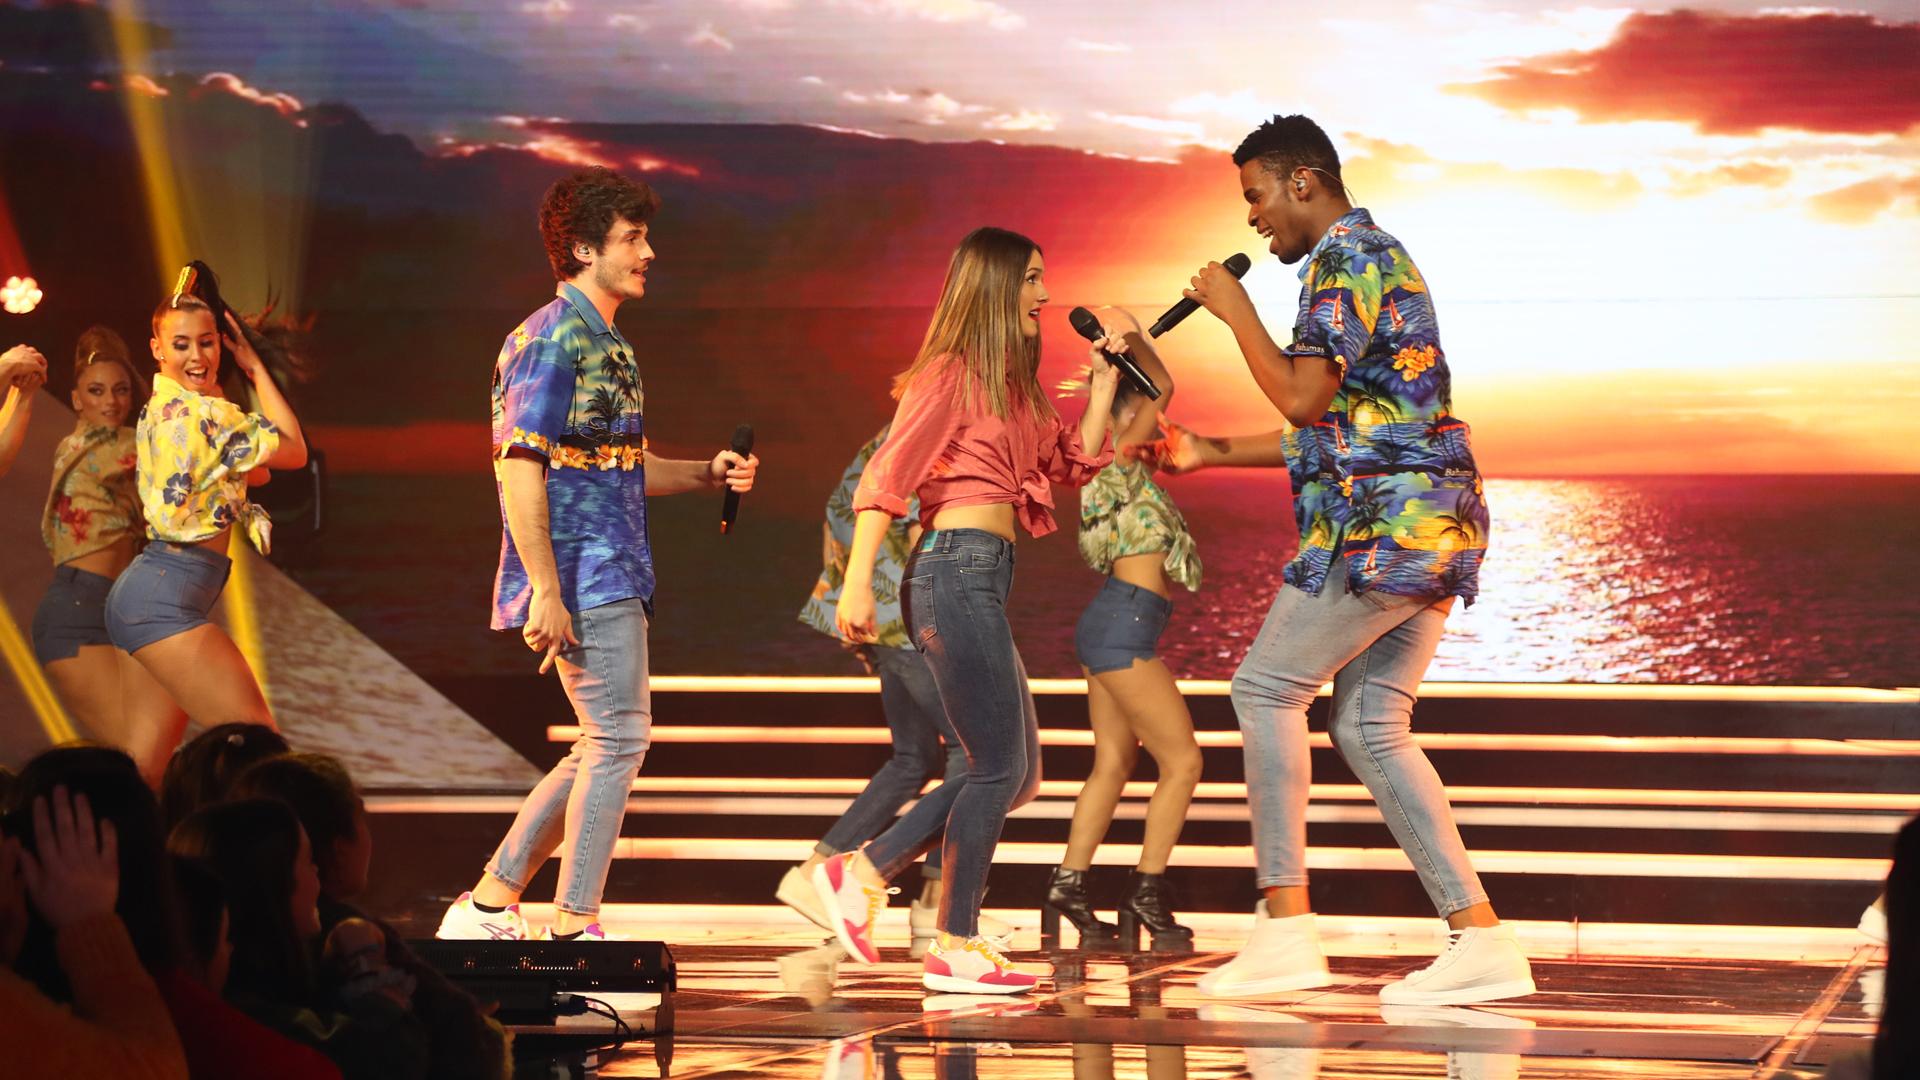 Famous, Miki Núñez, and Sabela Ramil in Operación triunfo (2001)